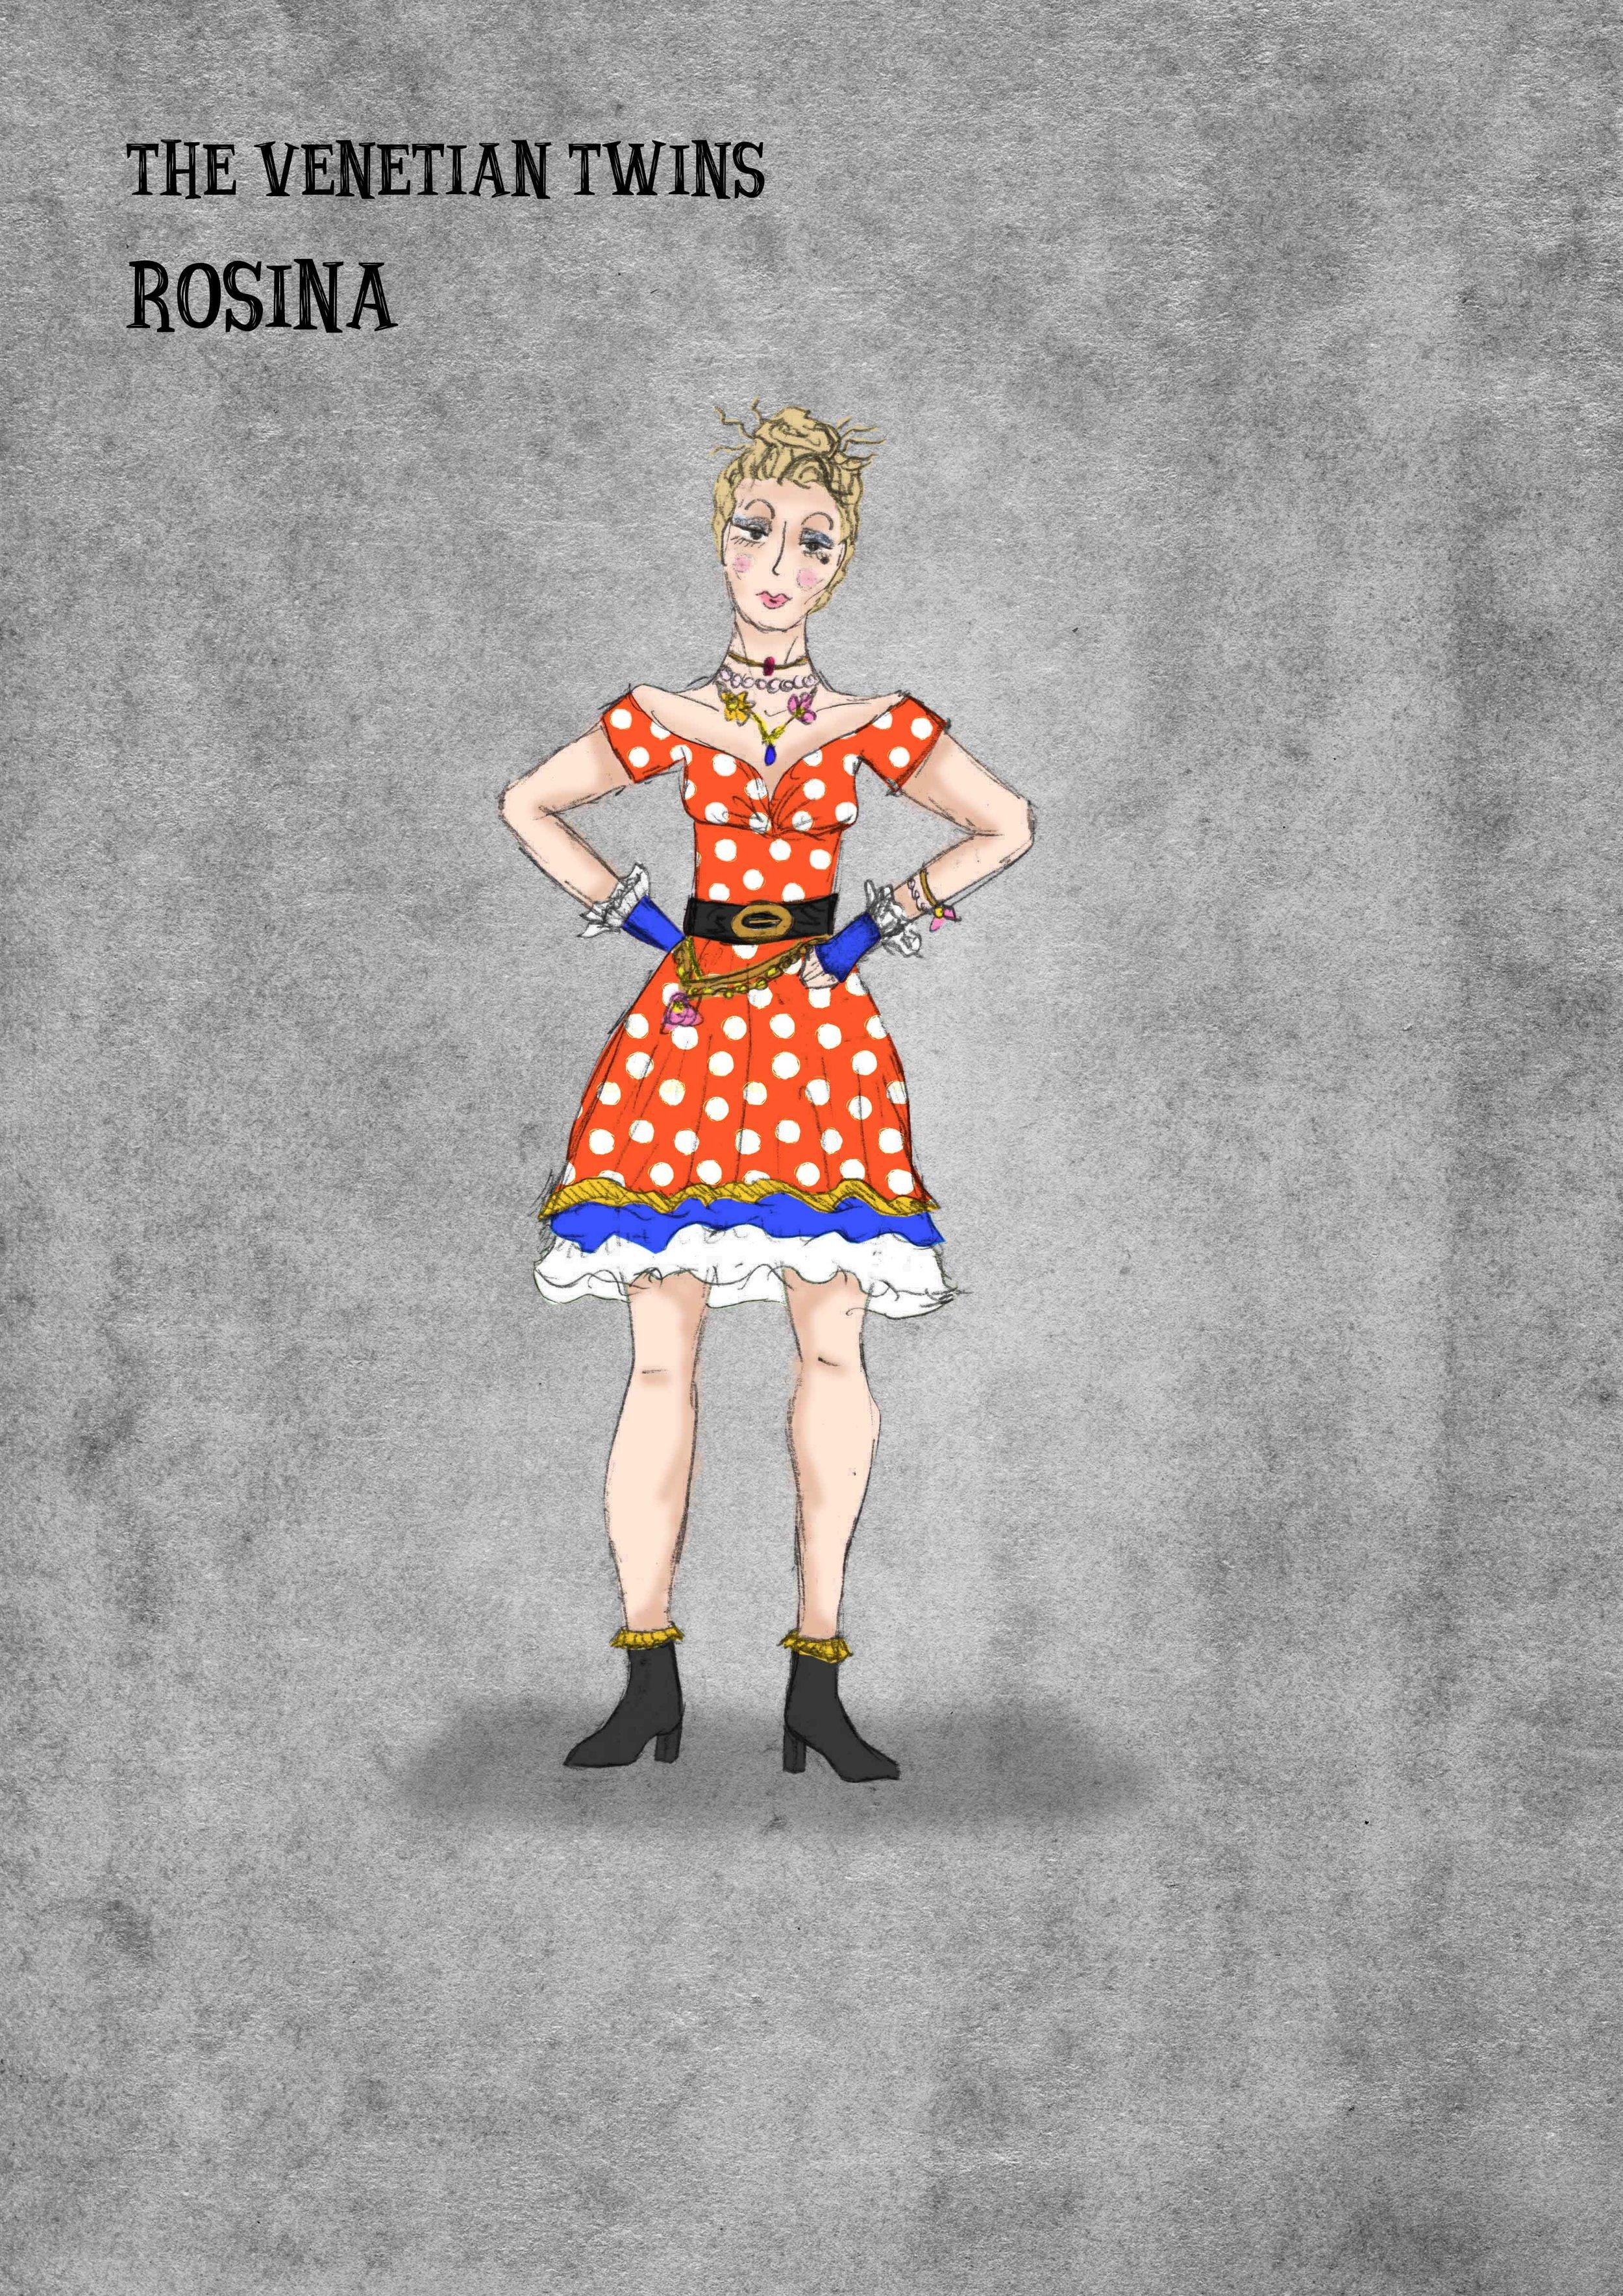 Julia-Spizzica-Design-Venetian-Twins